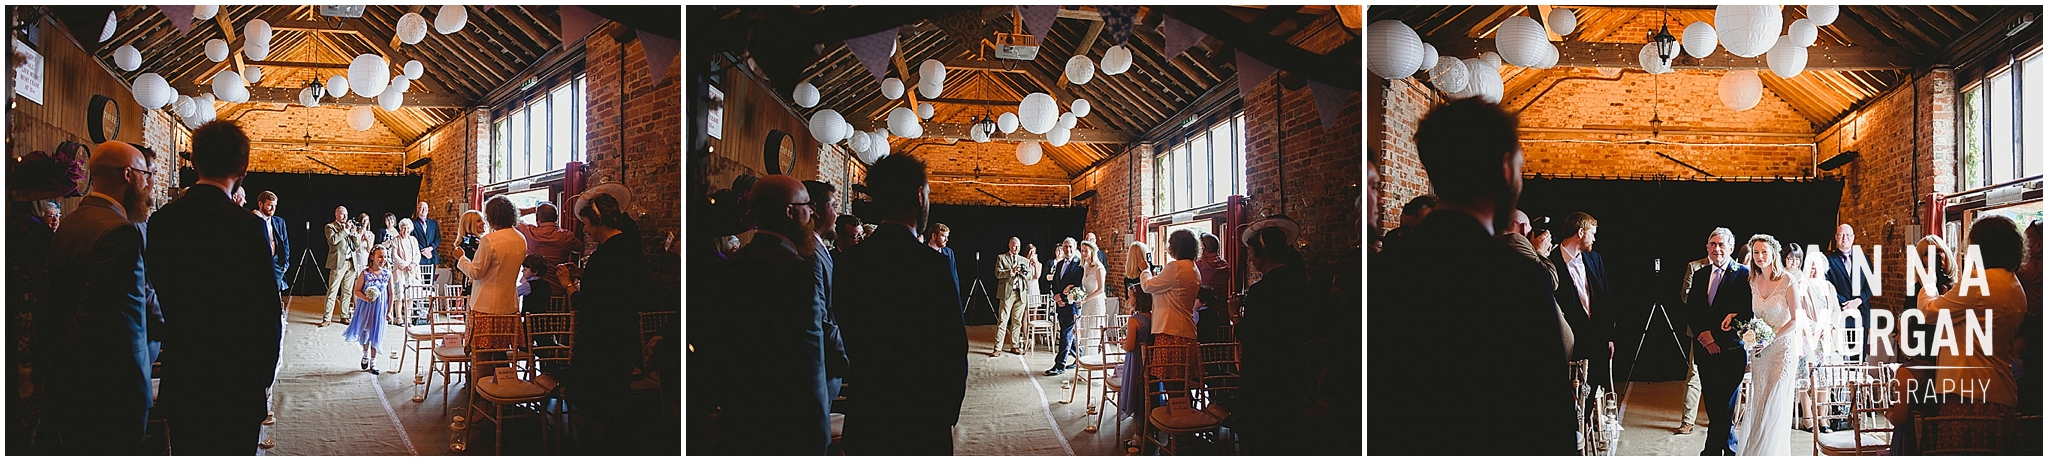 Amy & Marc Three Tunns Wedding Bransgore Dorset-23